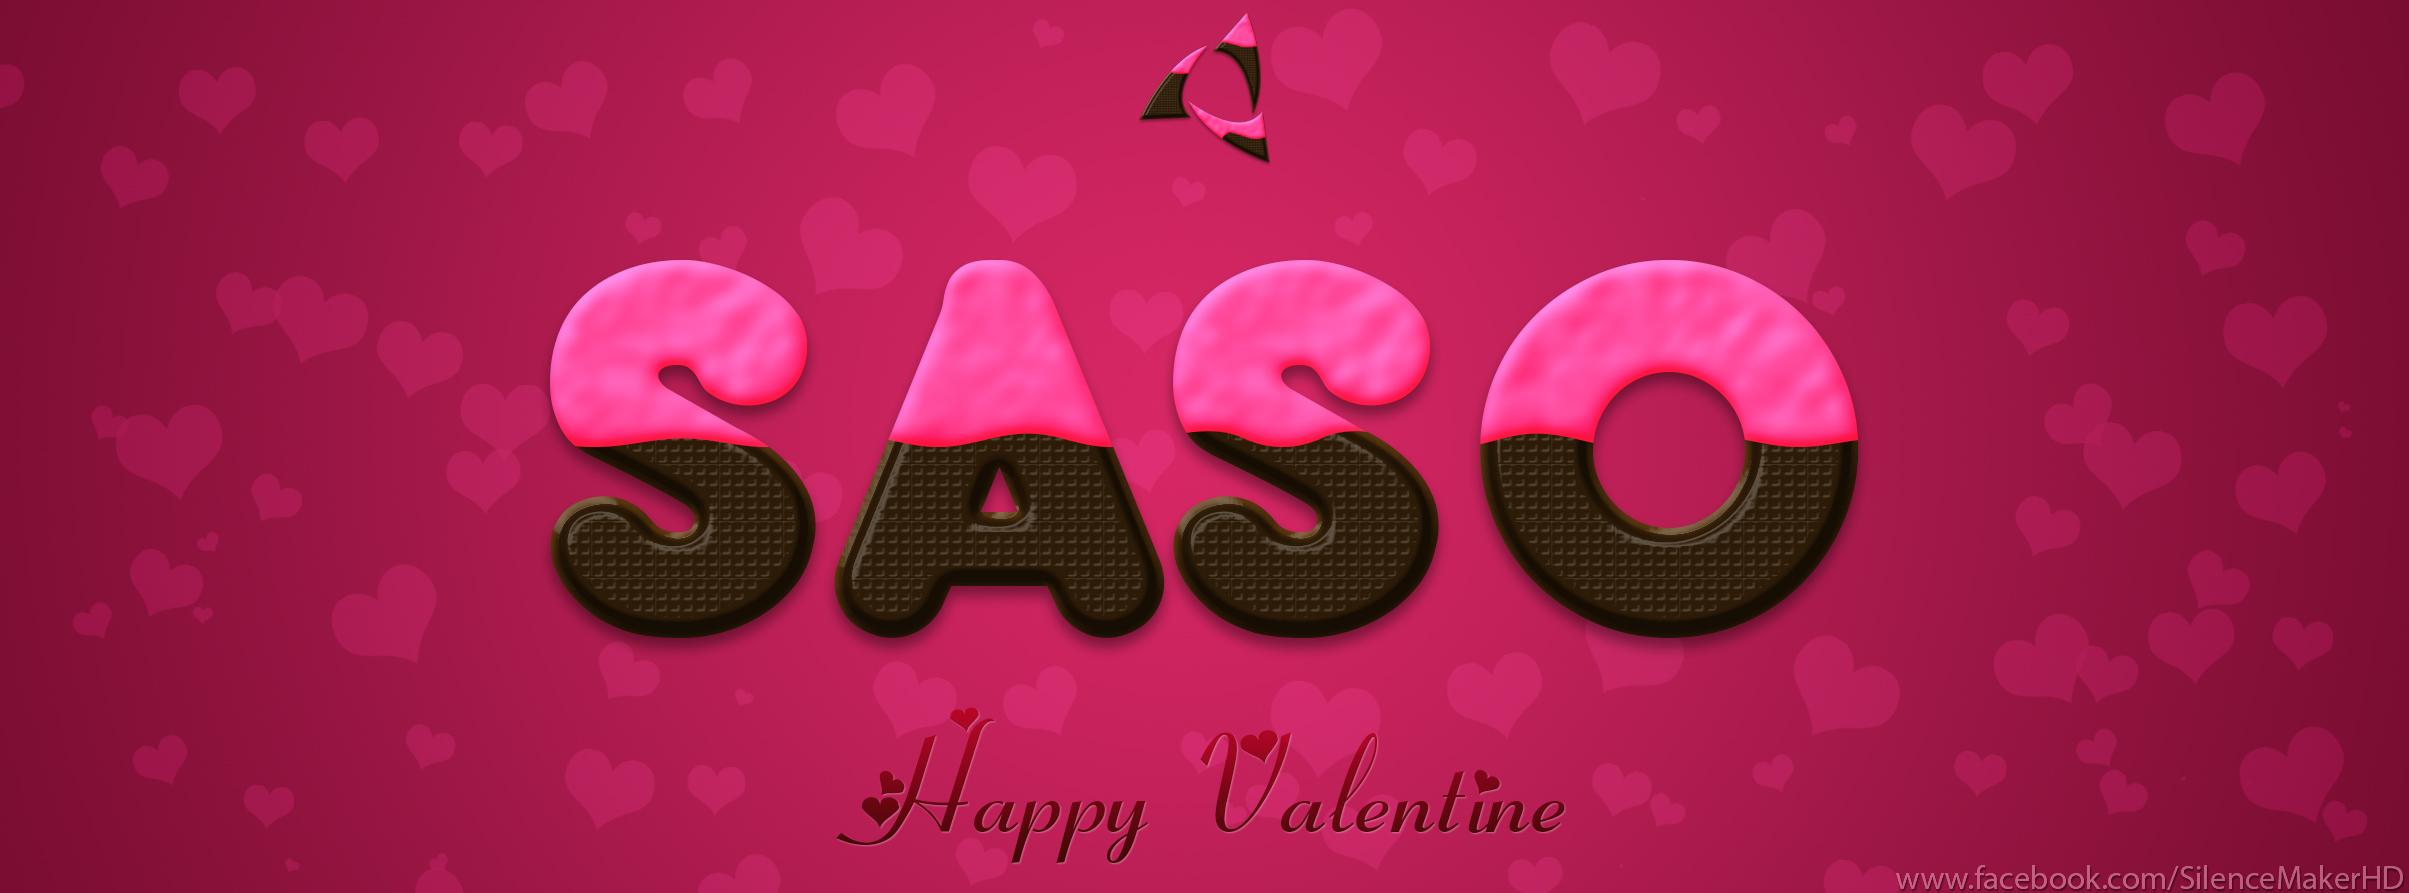 Good Wallpaper Name Style - saso_name___valentine_style__by_silencemakerhd-d5u1oso  2018_4202.jpg